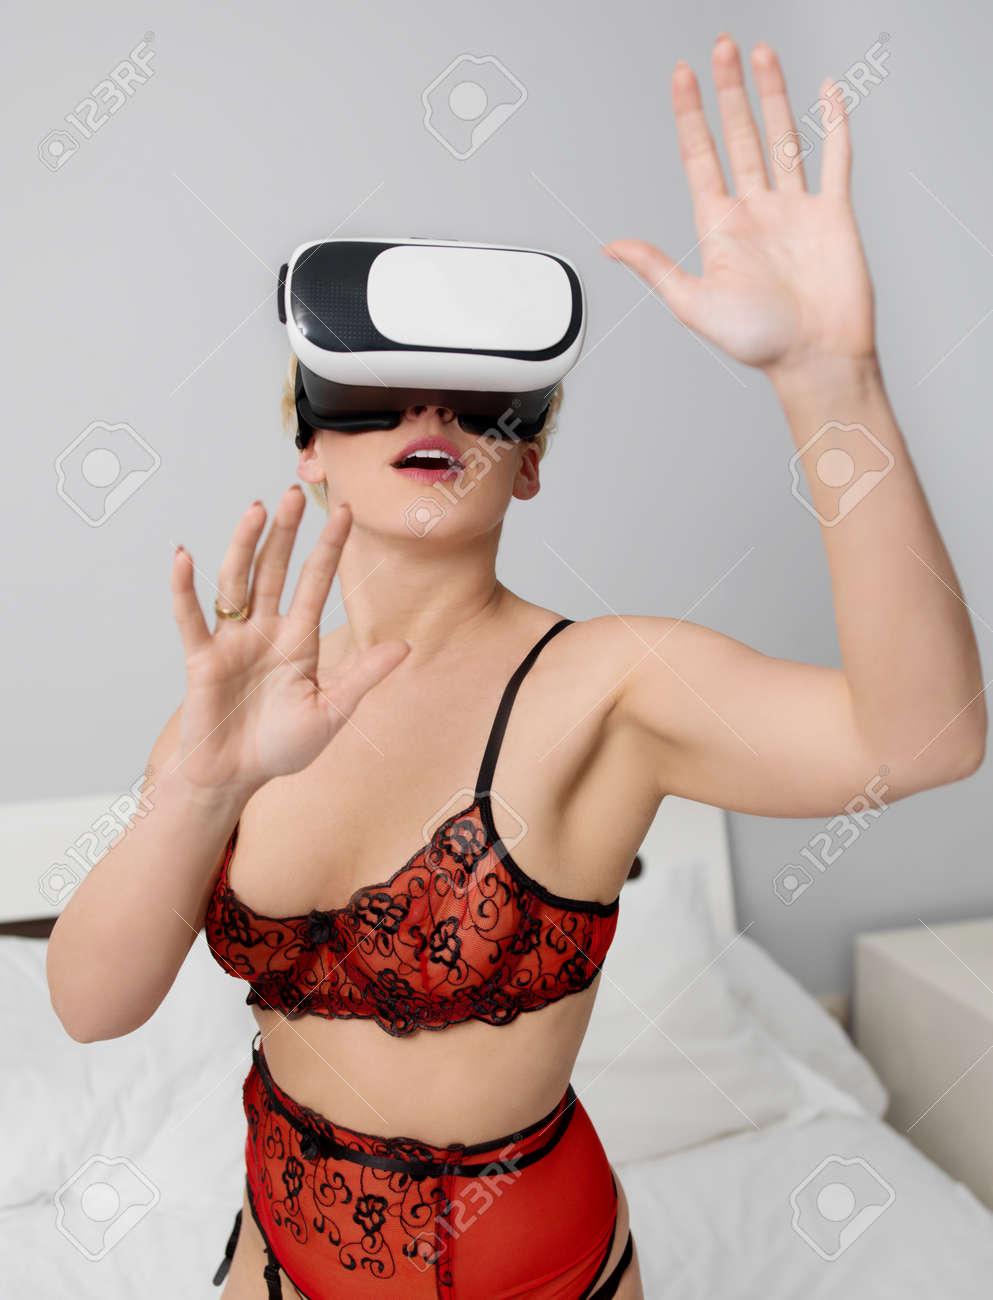 Hot girls fucking sexgifs